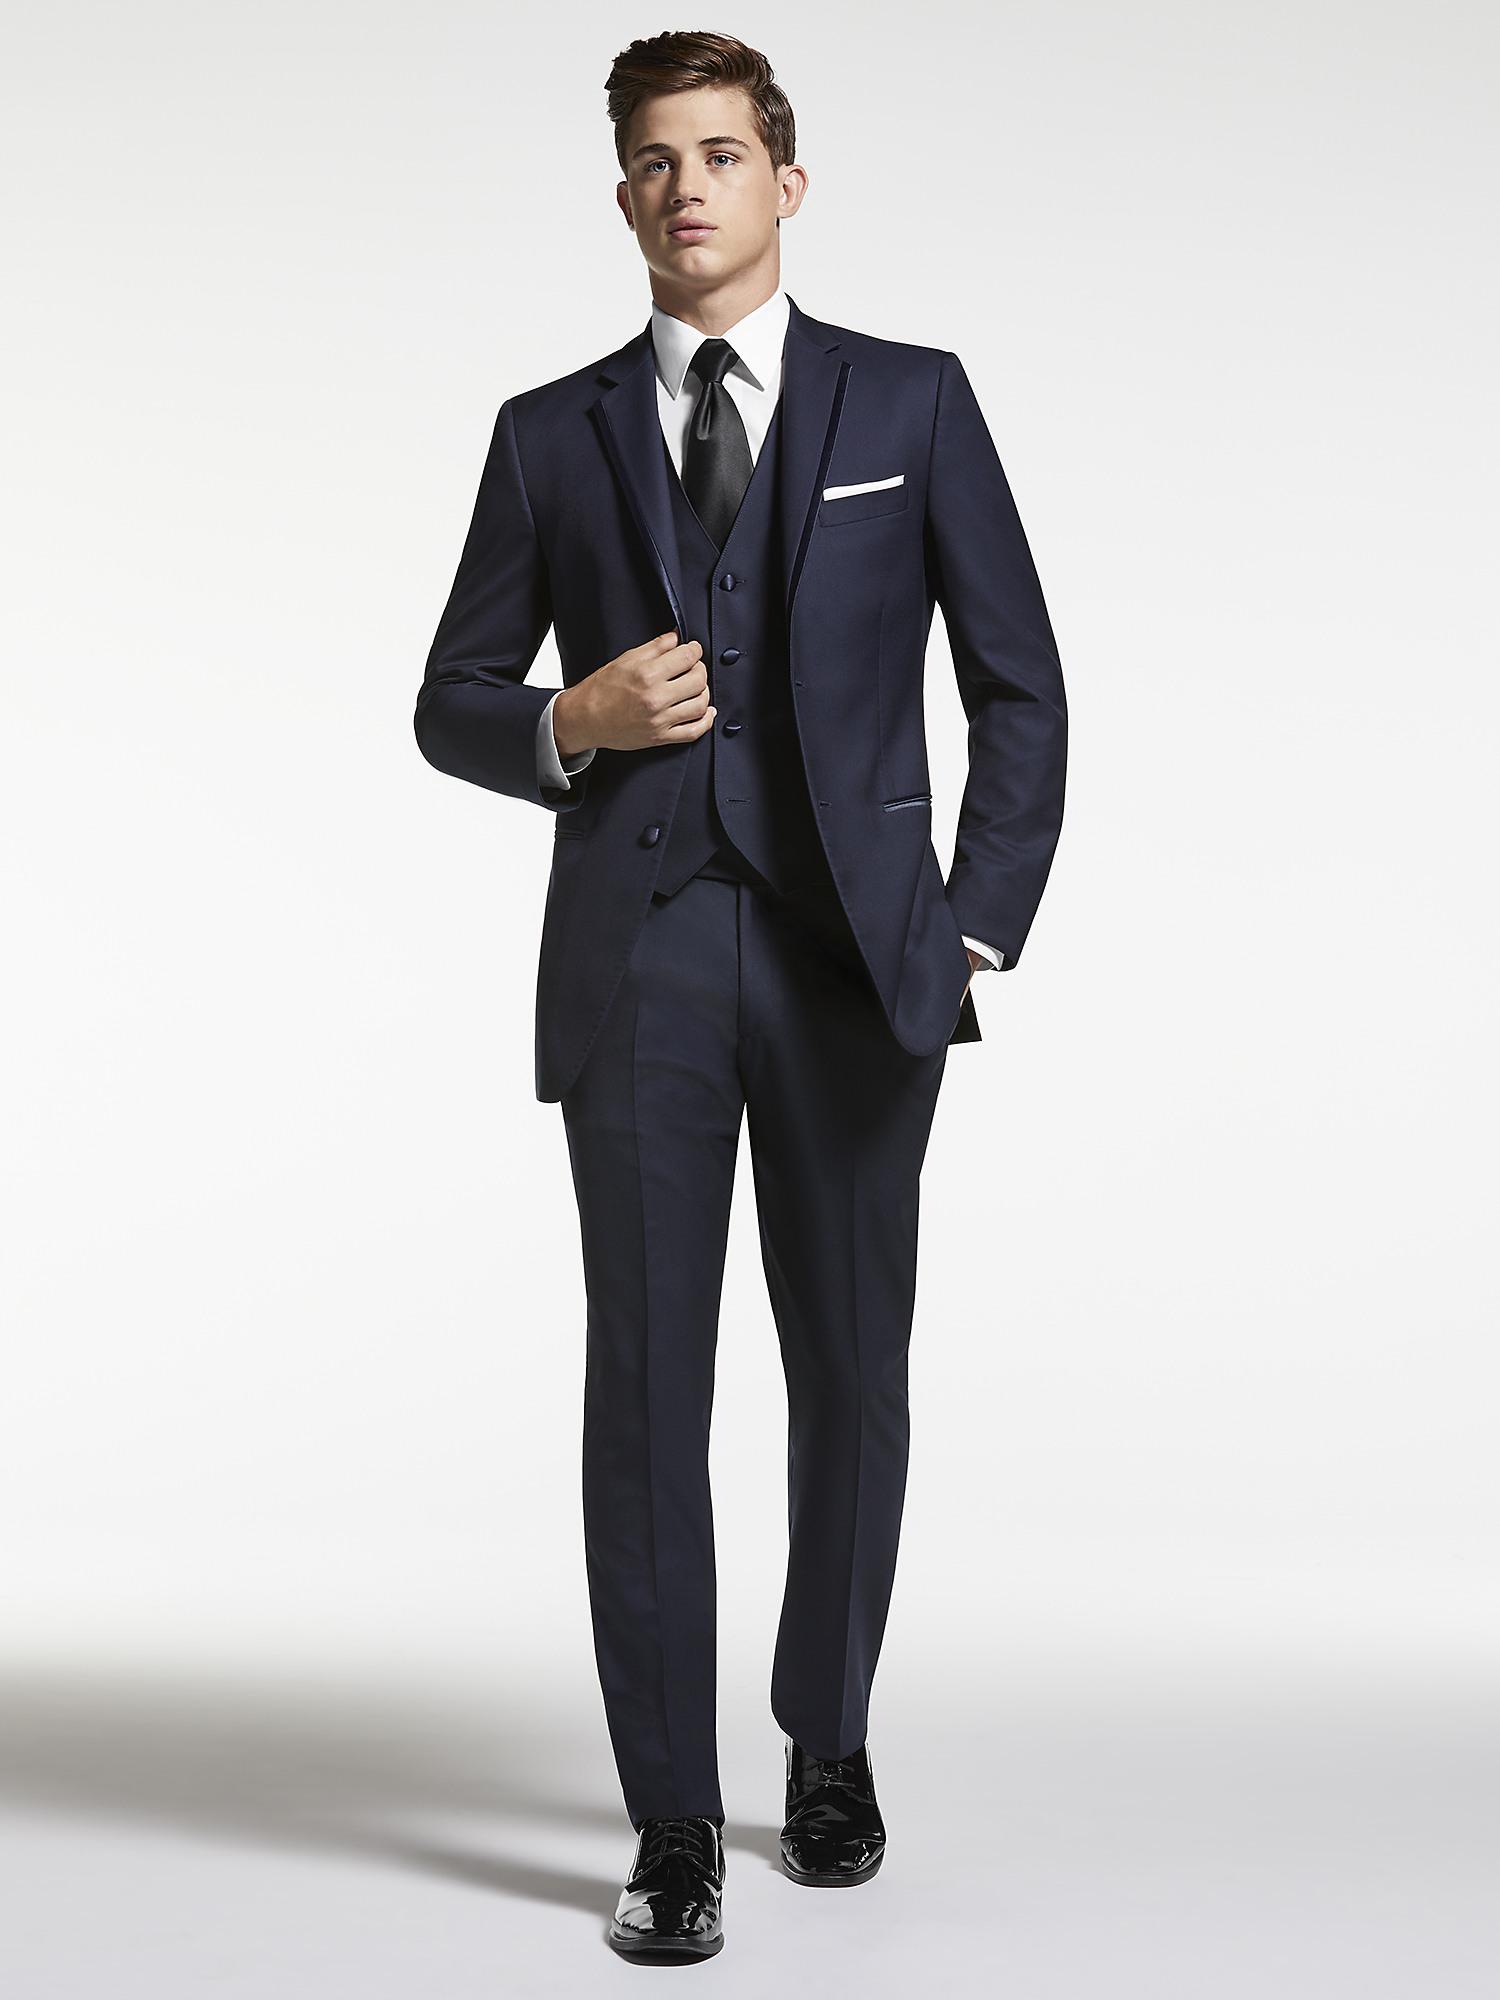 ed6bbd0c7cf Navy Blue Tuxedo by Joseph Abboud | Tuxedo Rental | Moores Clothing